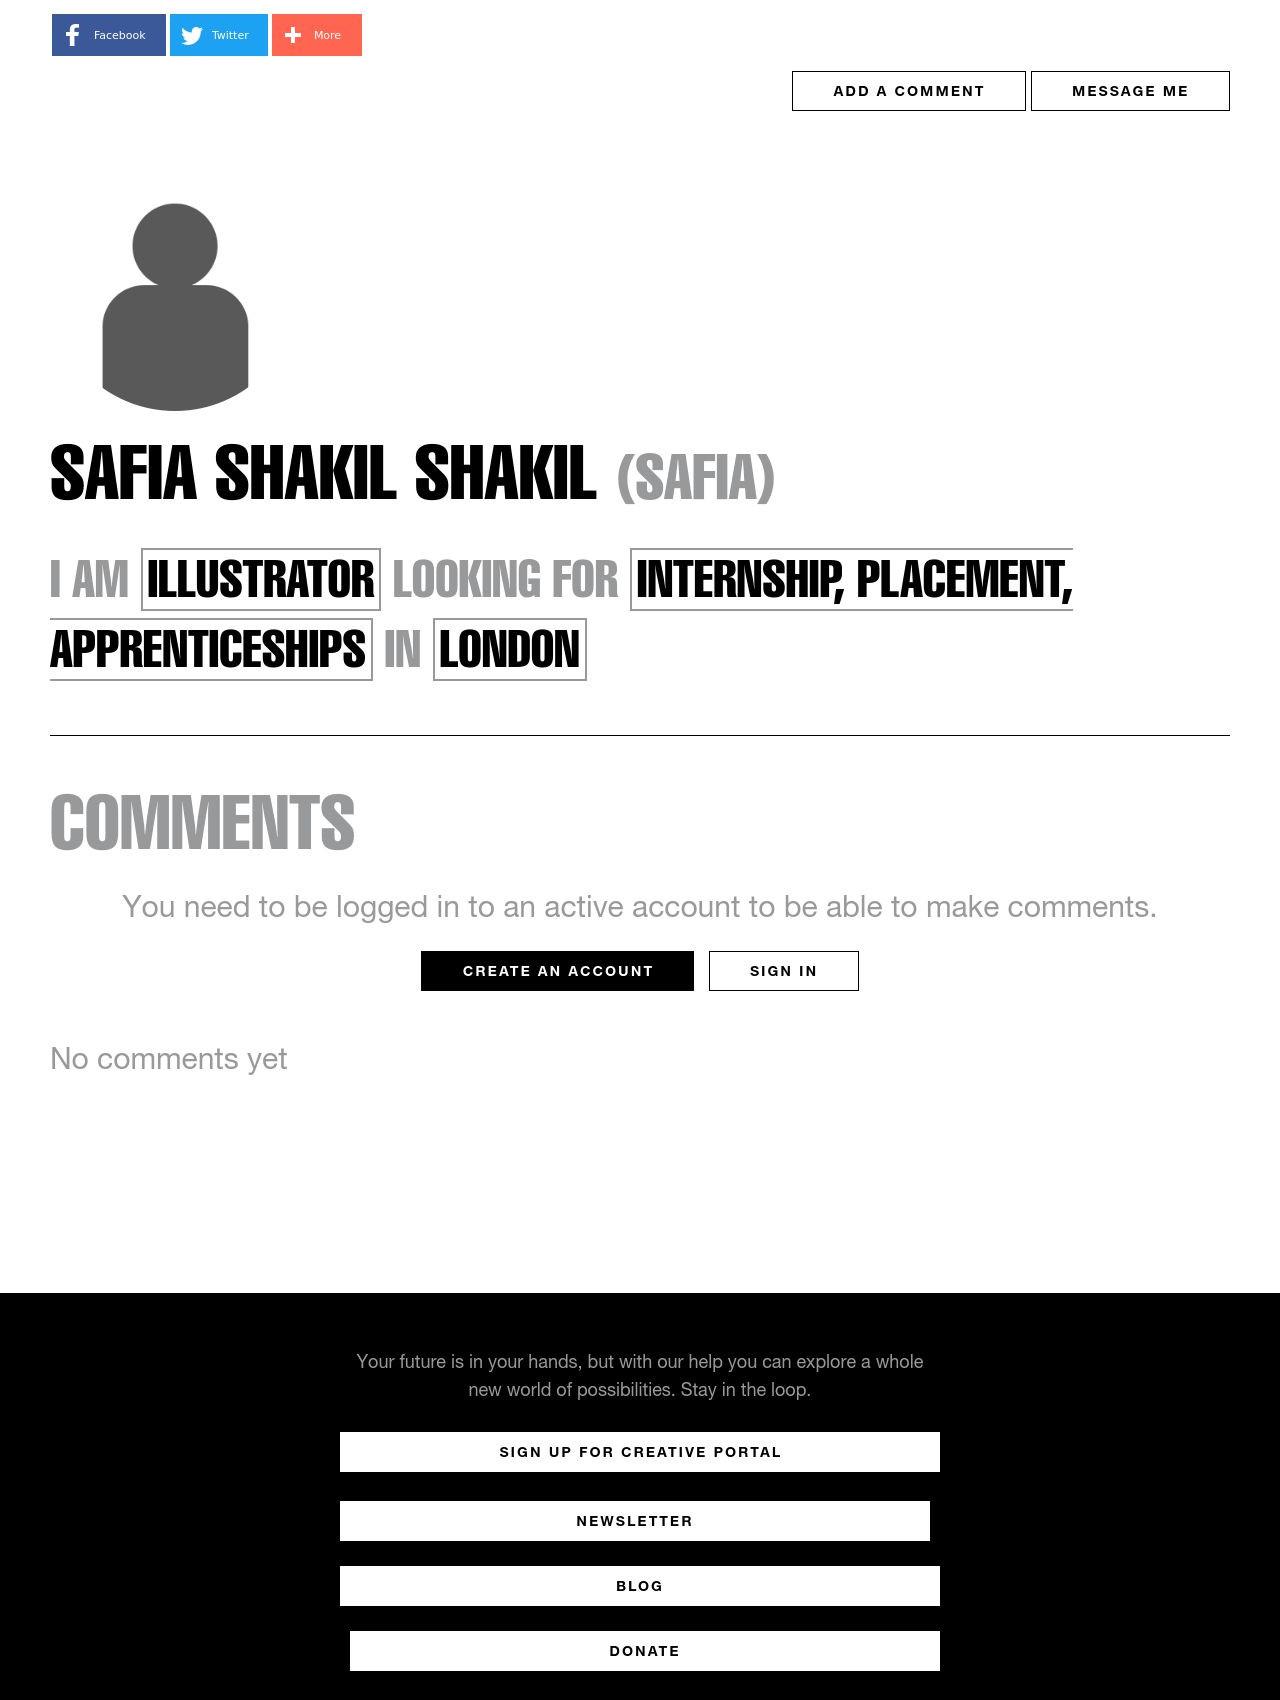 Safia Shakil Shakil